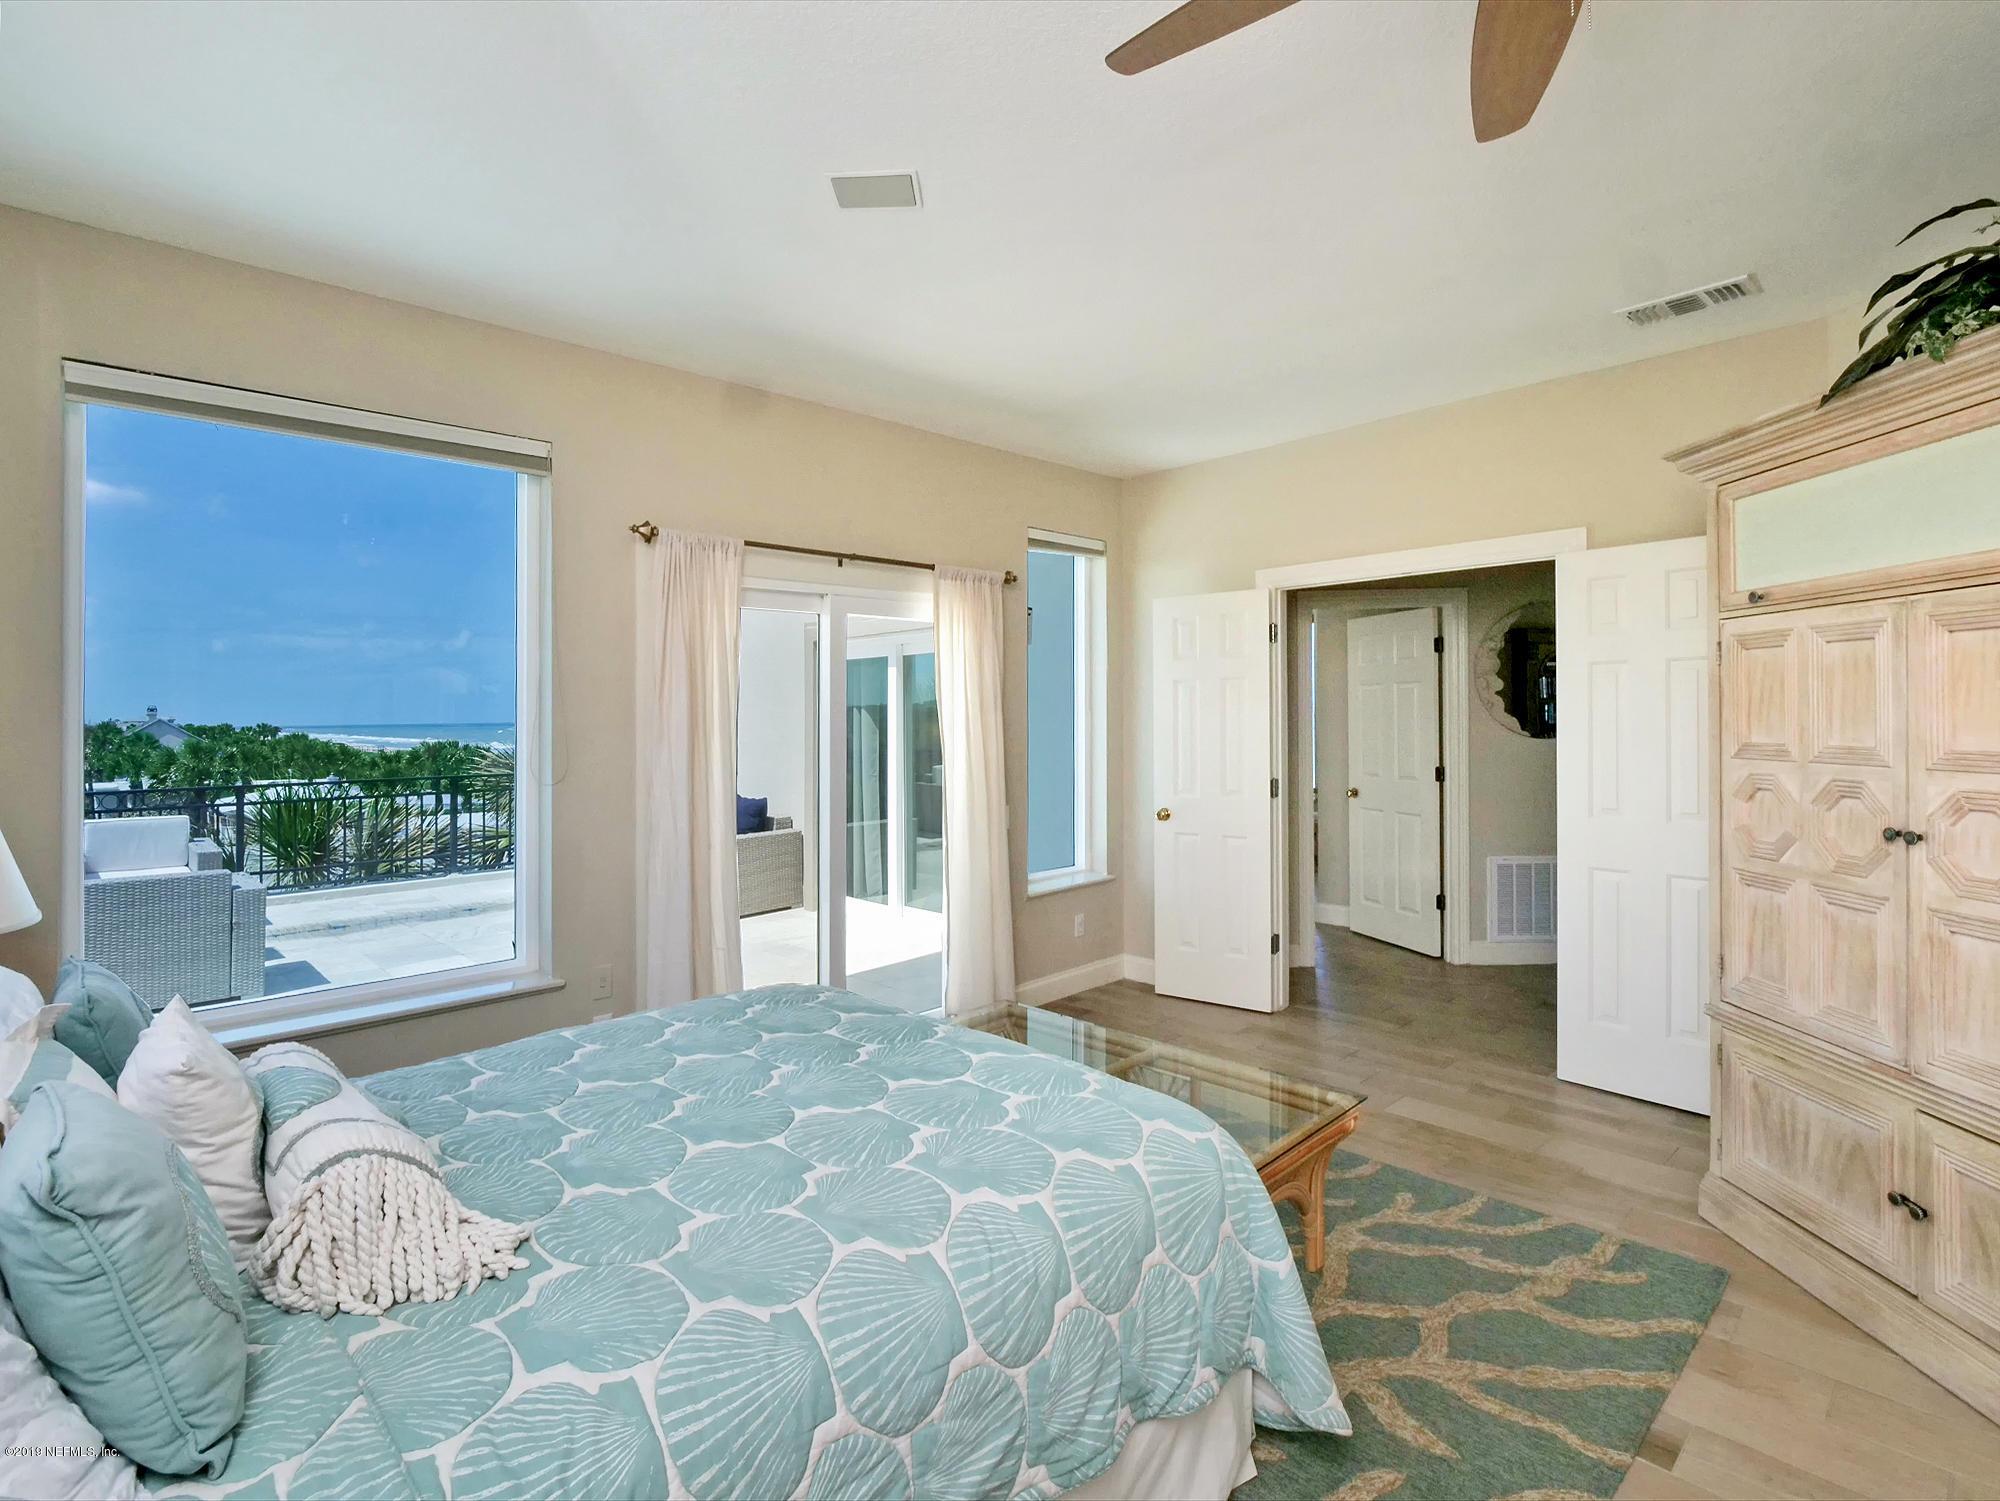 2521 PONTE VEDRA, PONTE VEDRA BEACH, FLORIDA 32082, 5 Bedrooms Bedrooms, ,4 BathroomsBathrooms,Residential - single family,For sale,PONTE VEDRA,993129